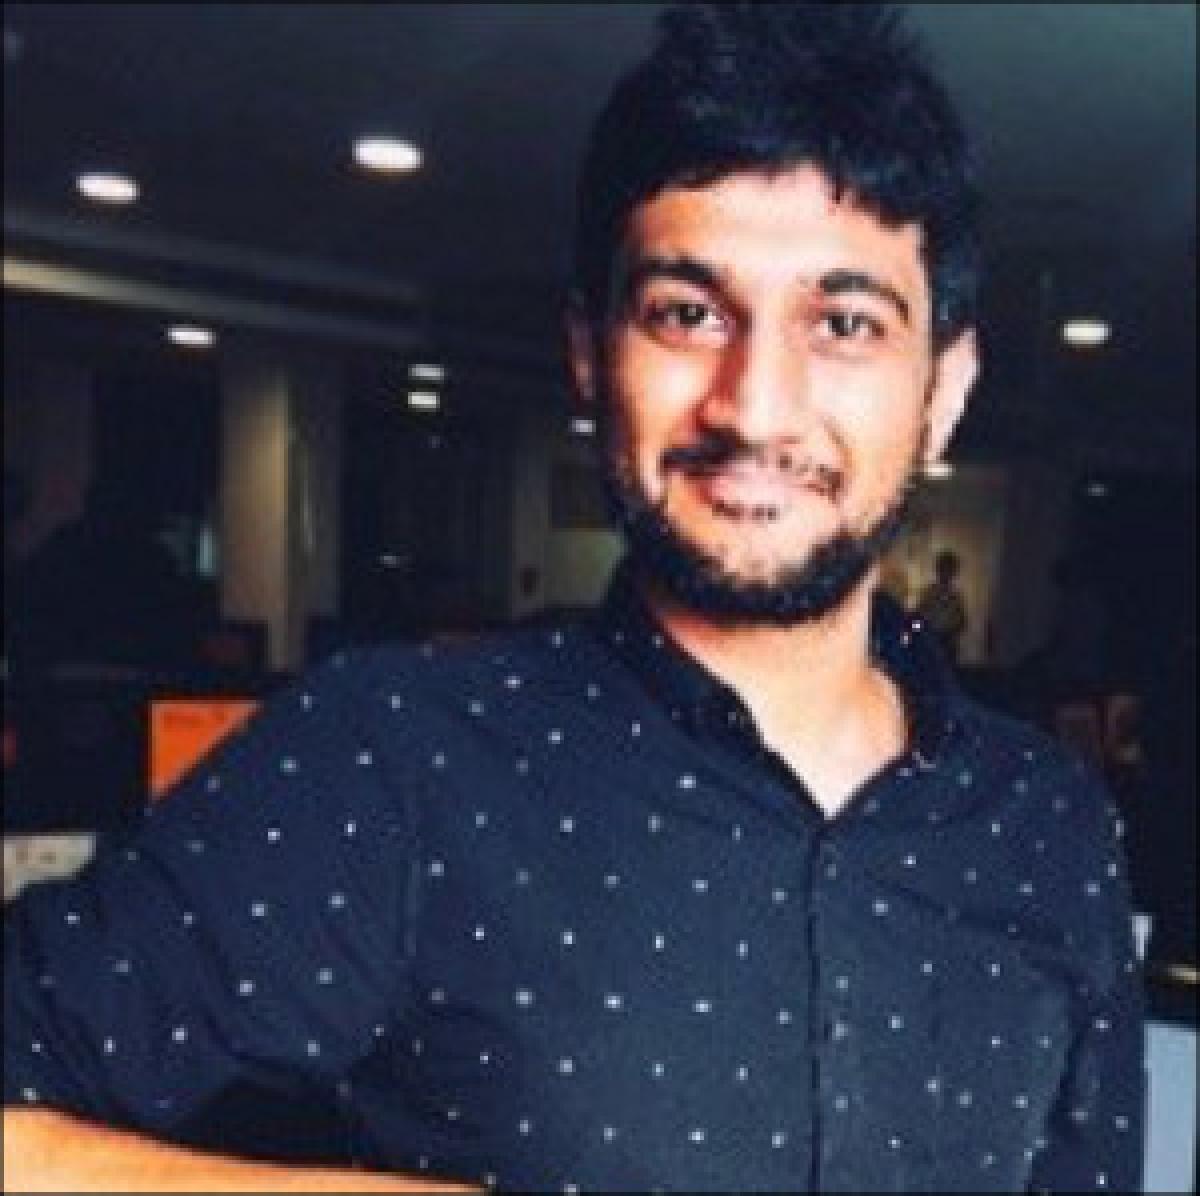 The Viral Fever's marketing head Vineet Kanabar to join Wavemaker